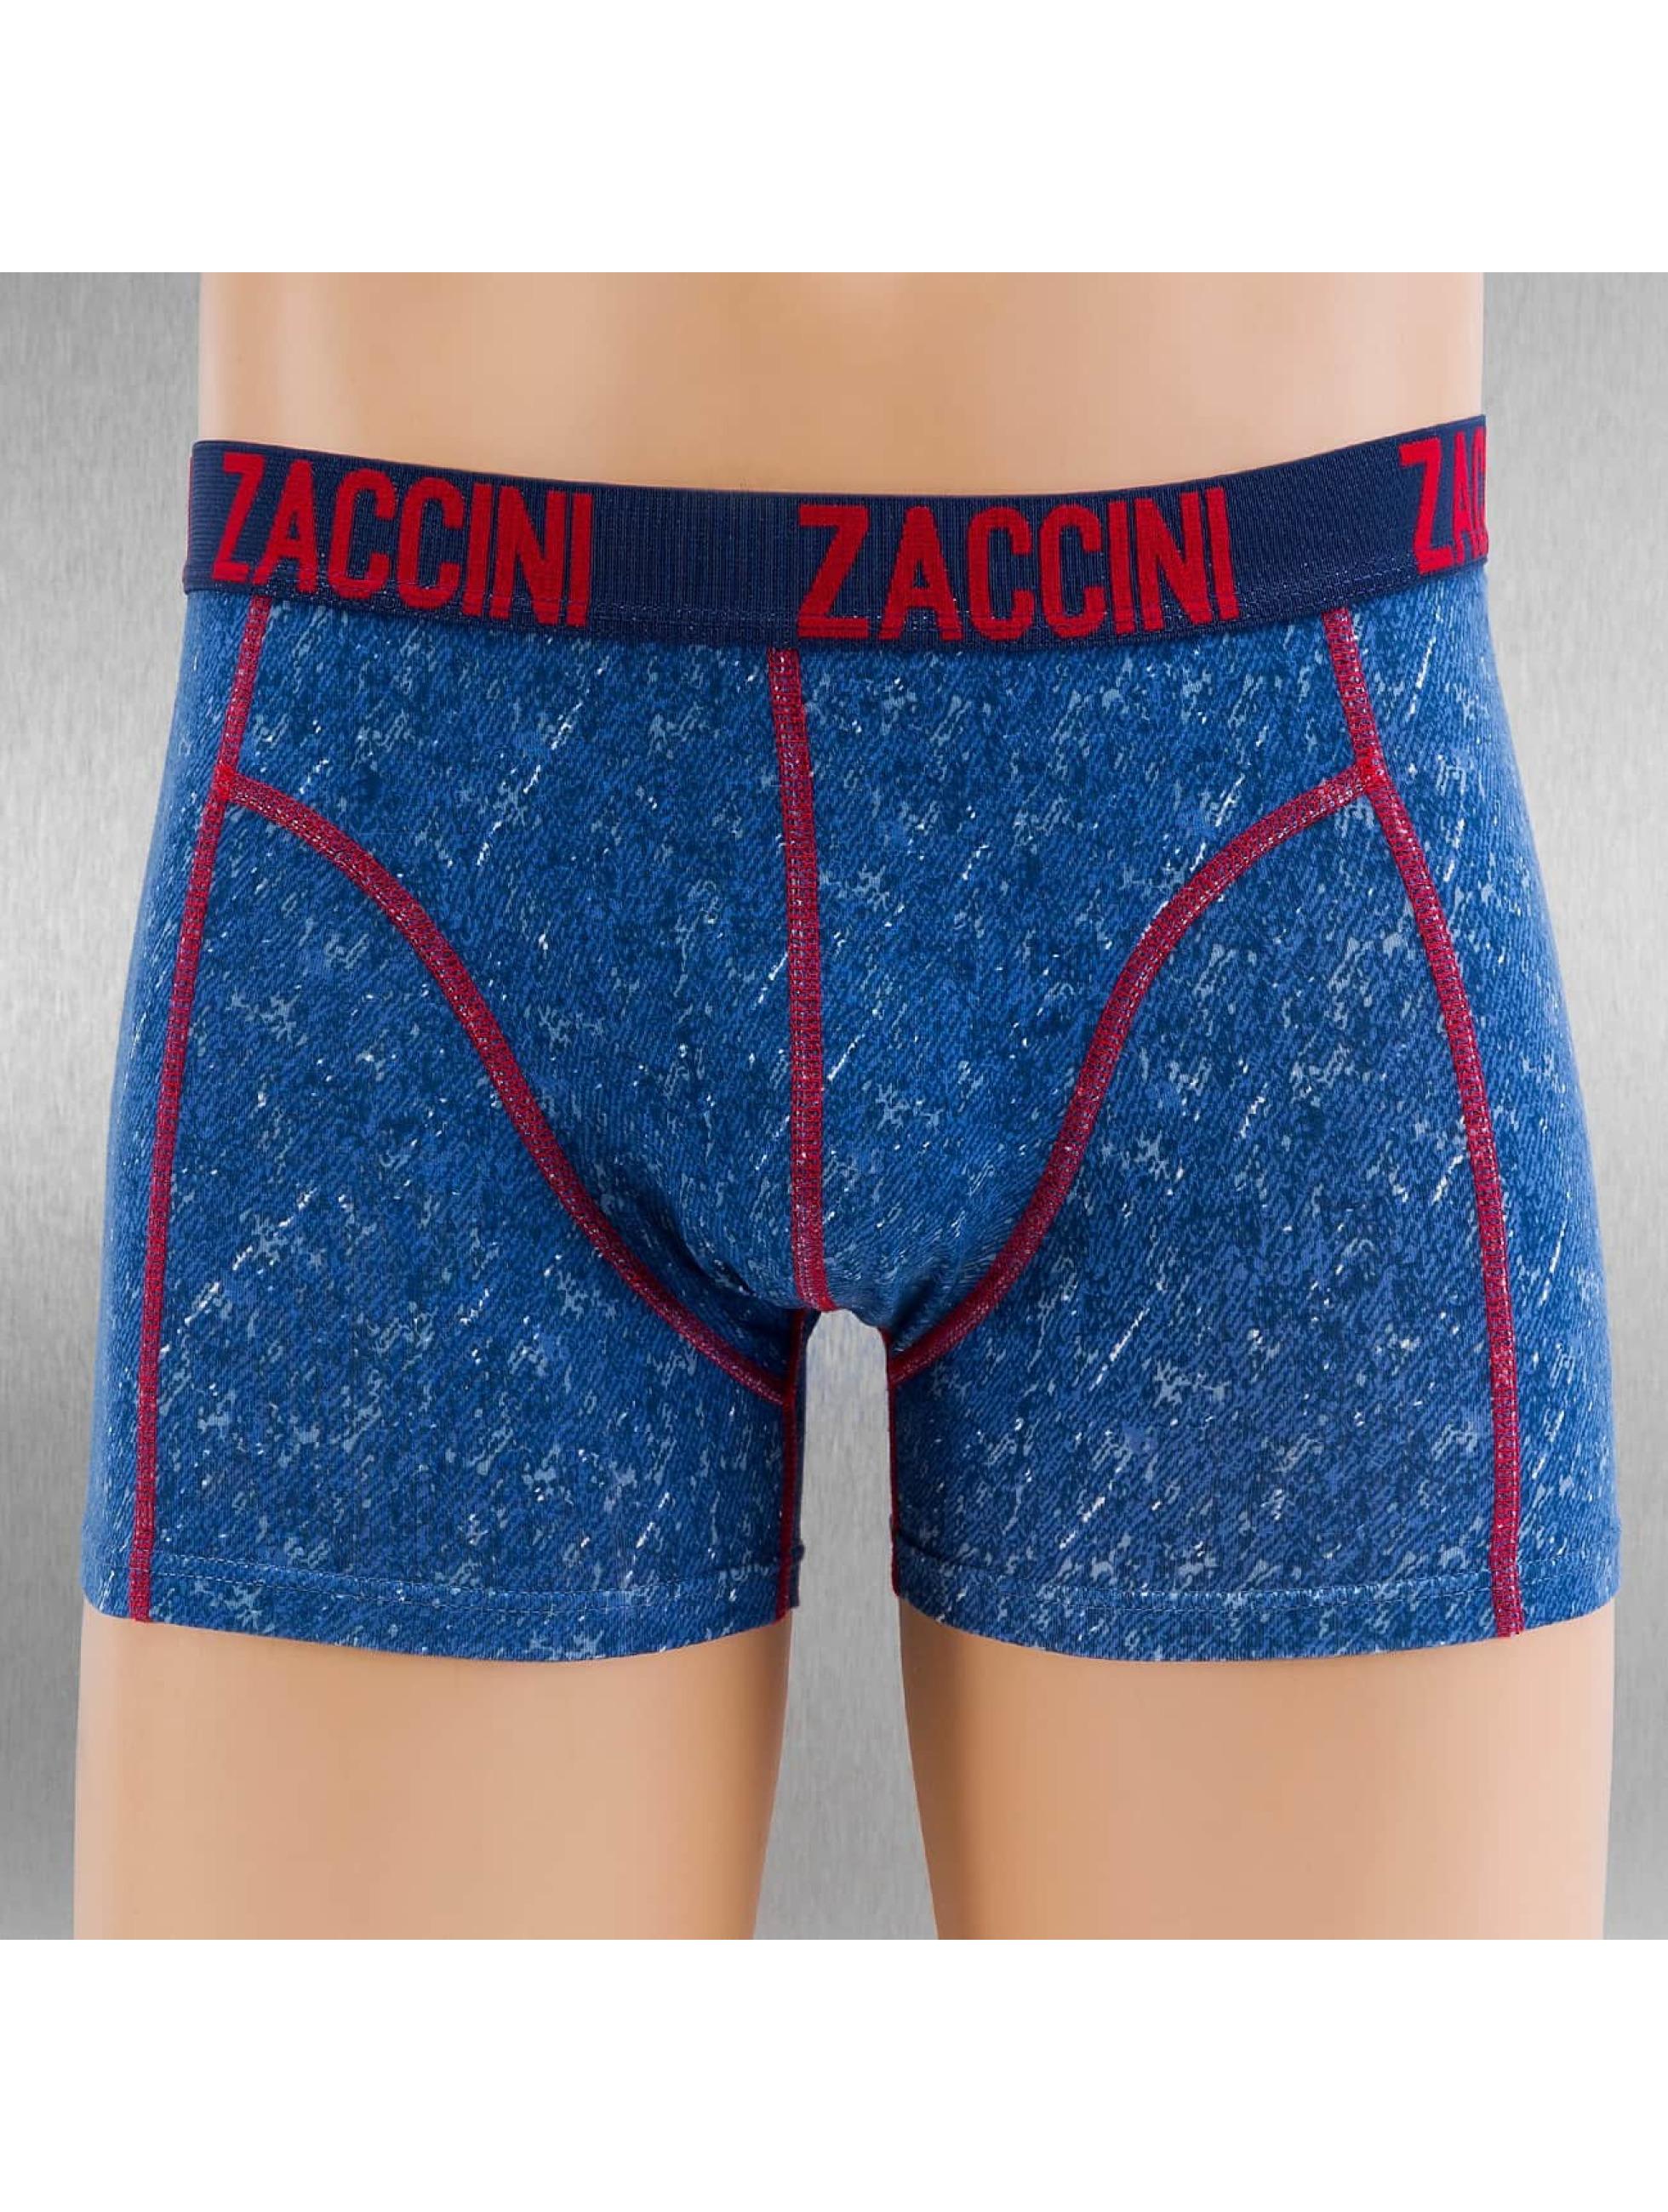 Zaccini Семейные трусы Denim 2-Pack синий